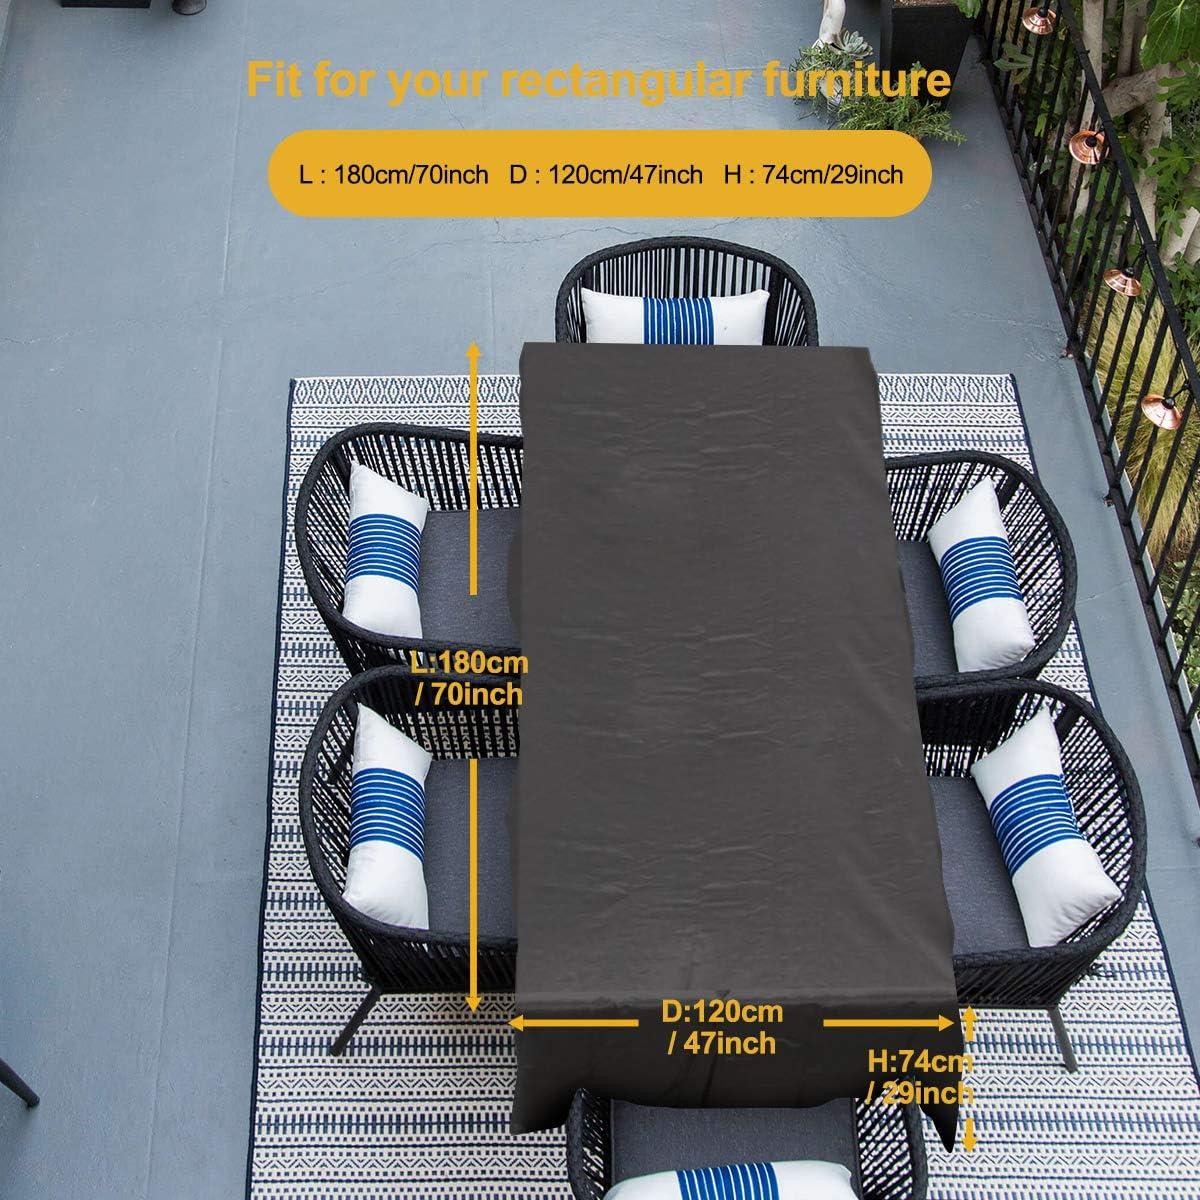 170 * 94 * 70 cm Tela 600D Impermeable Anti-UV Patio Protectores con DiezTama/ños. FlyLemon Fundas Muebles Jardin